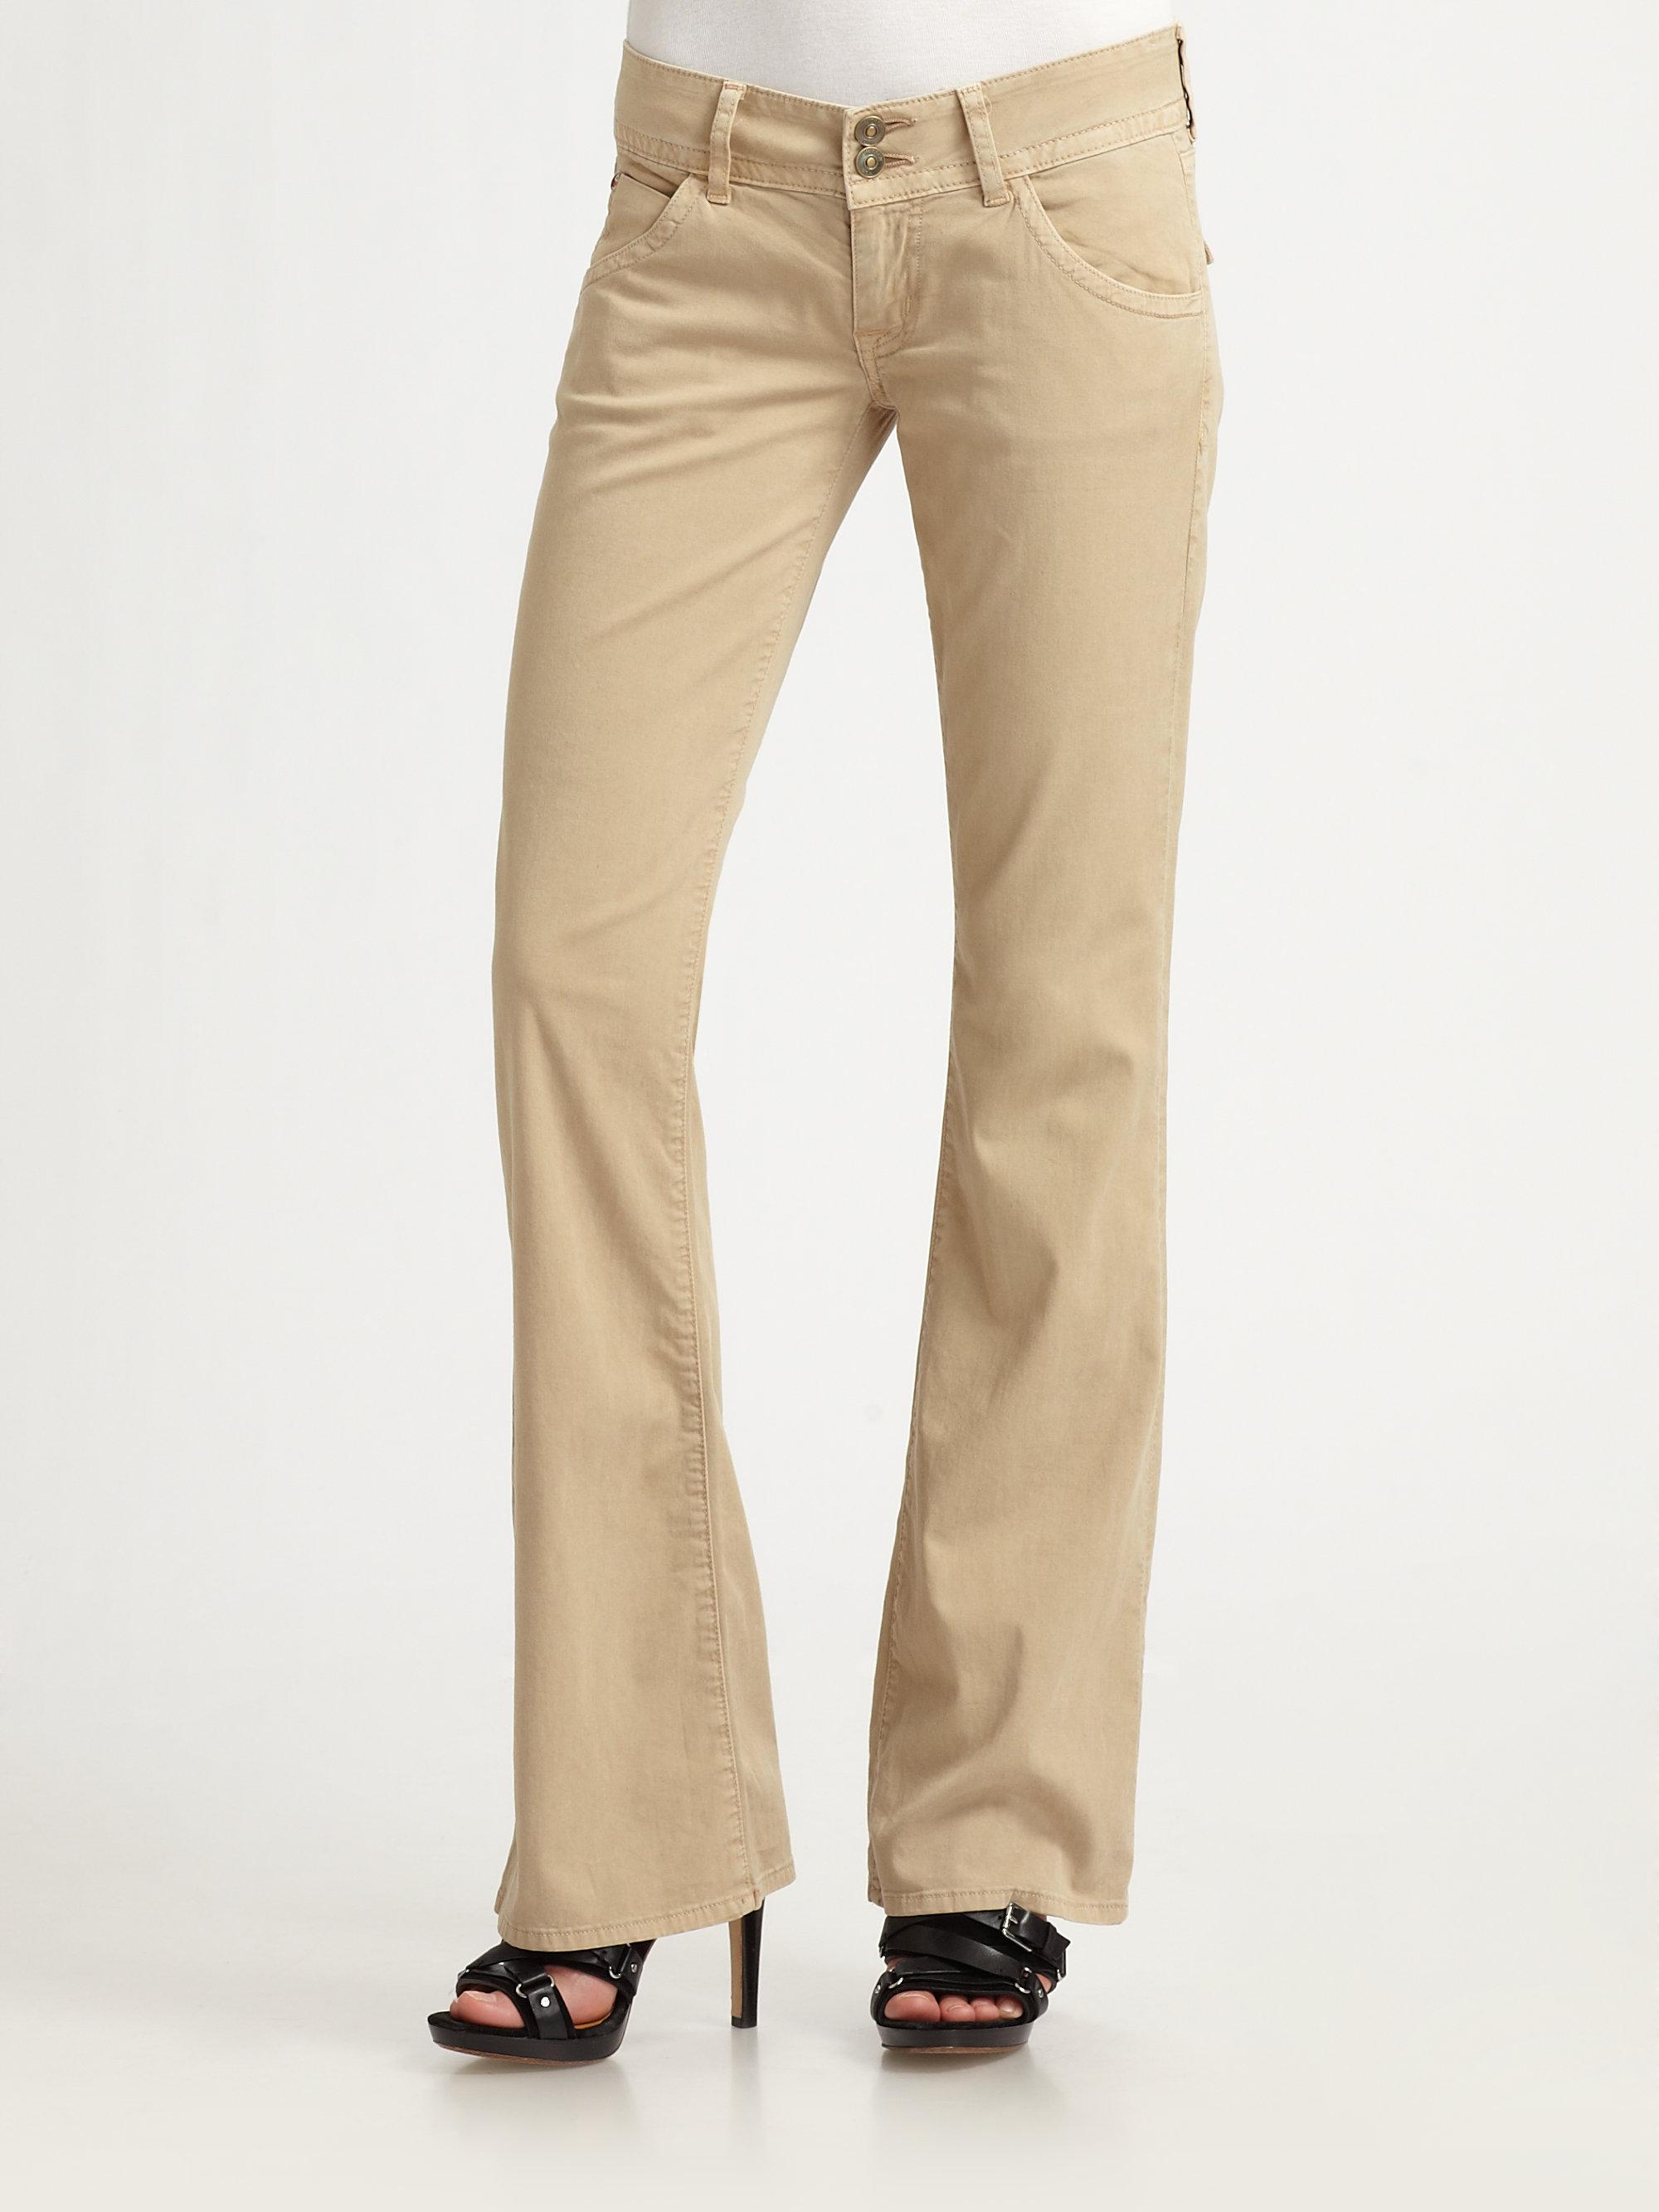 Bootcut Jeans Women